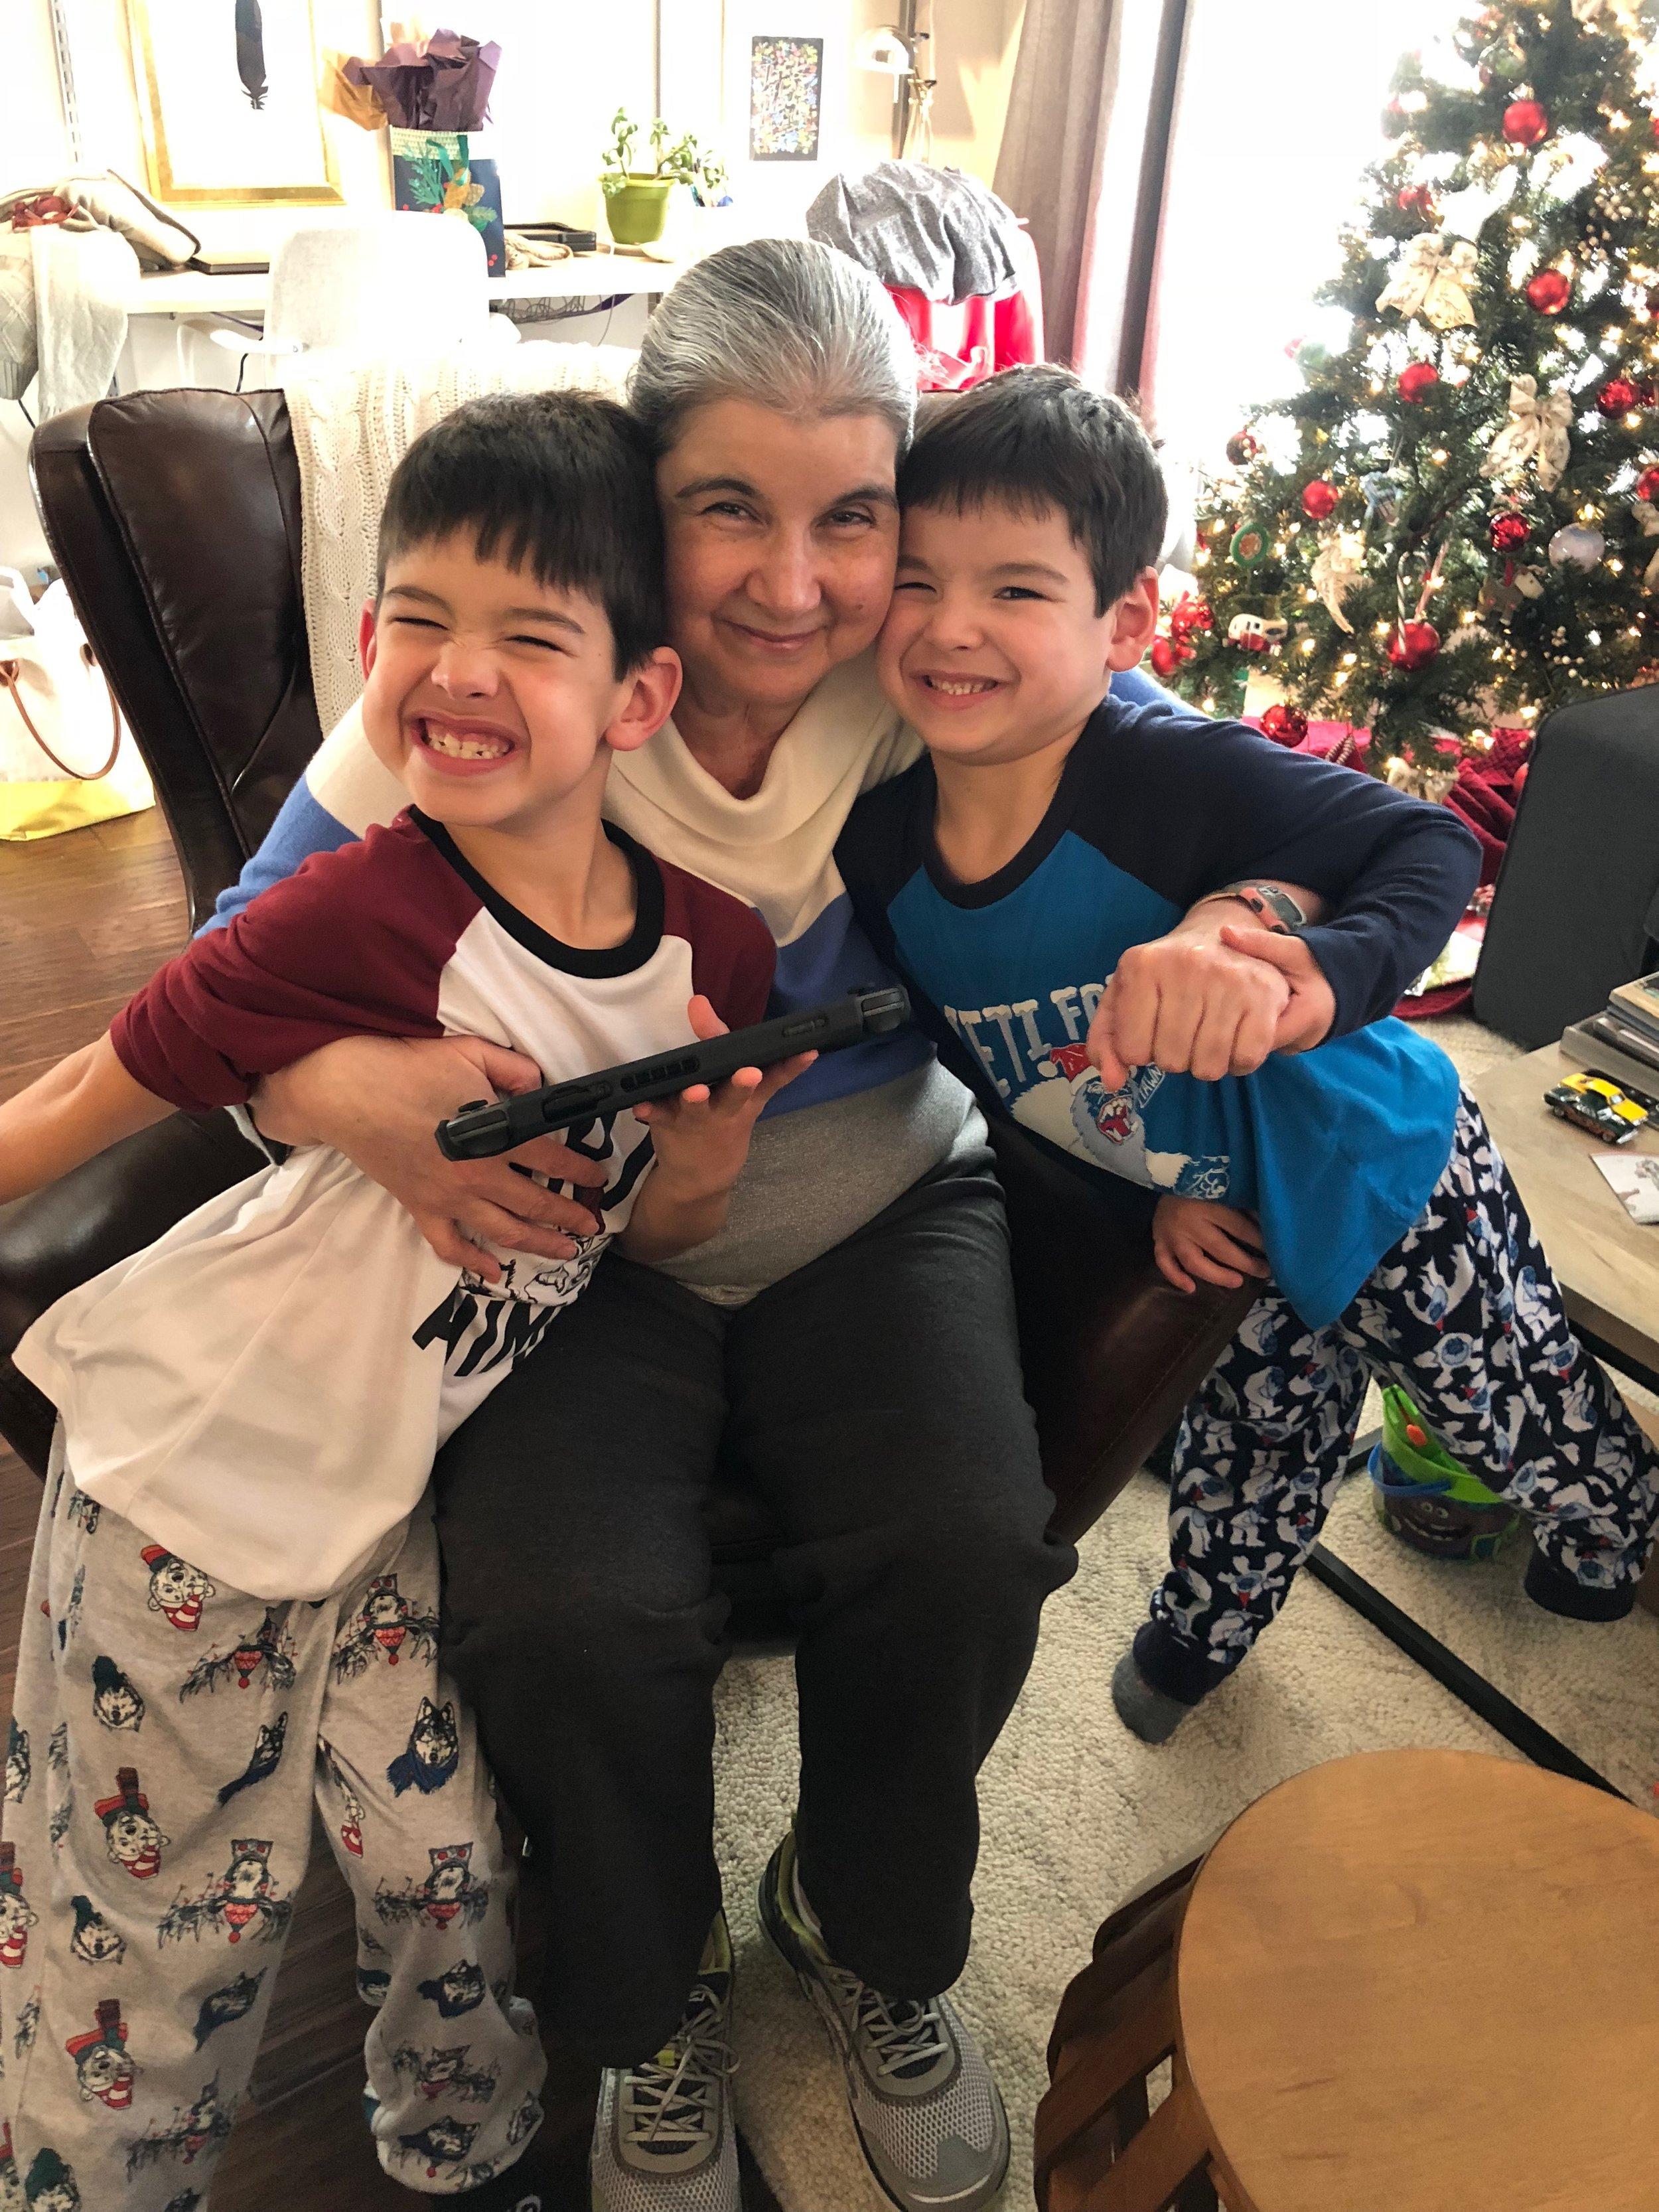 Will, Beba (grandma), Stevie on Christmas Day, 2017